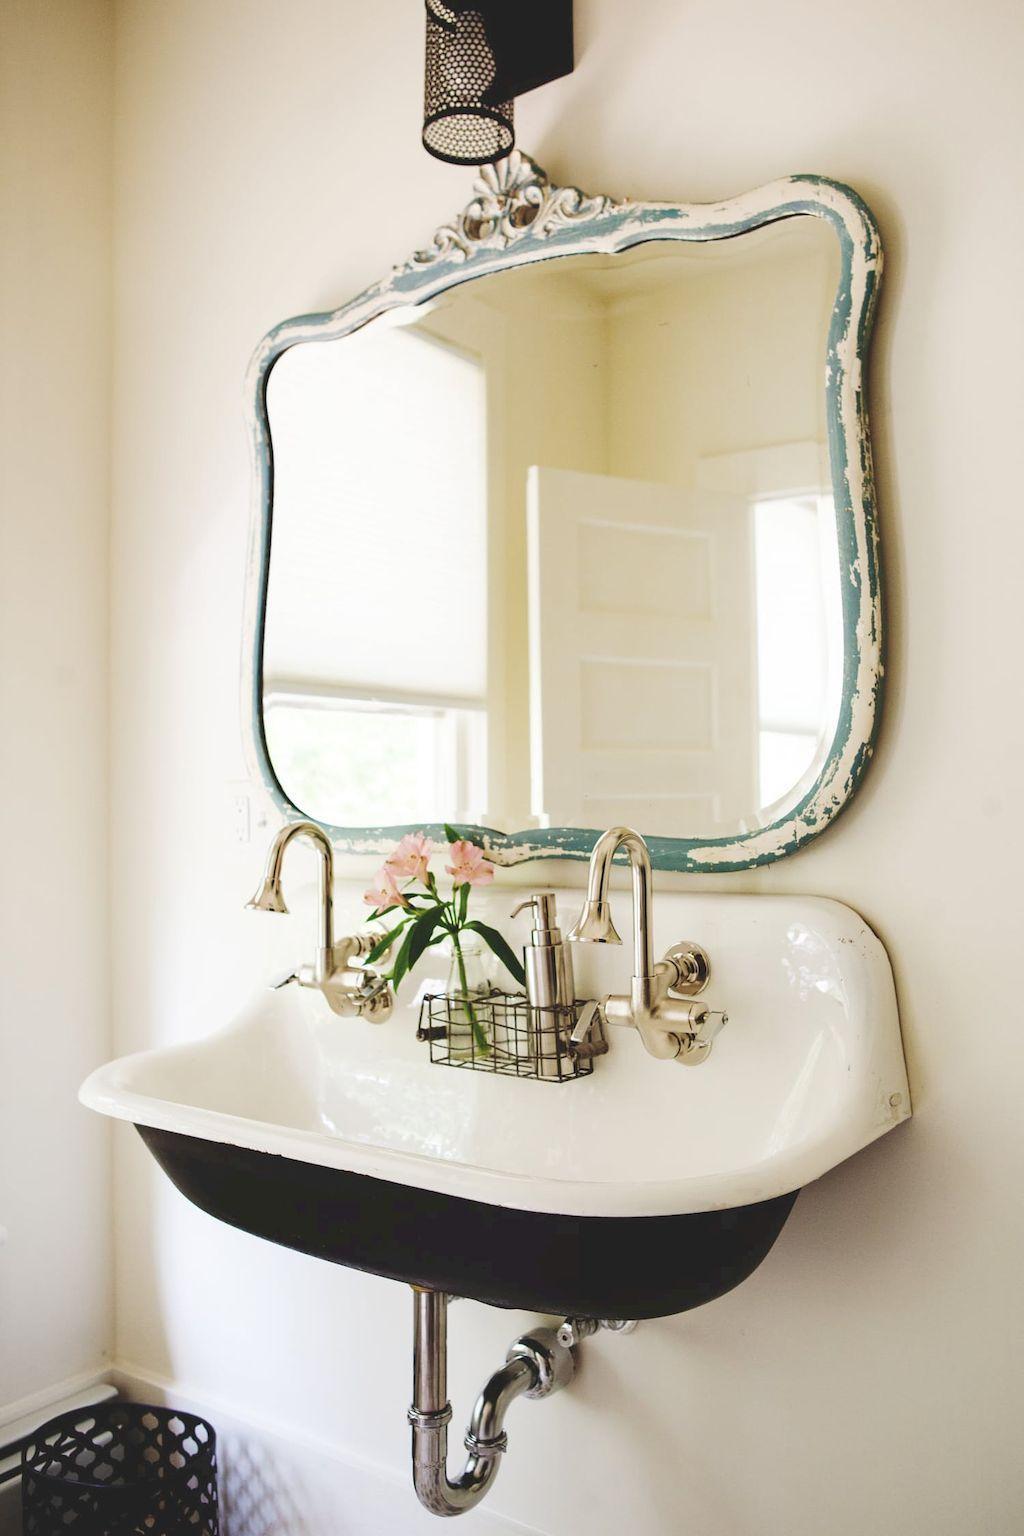 Miroir Sympa Salle De Bain ~ beautiful farmhouse bathroom remodel decor ideas 25 farmhouse